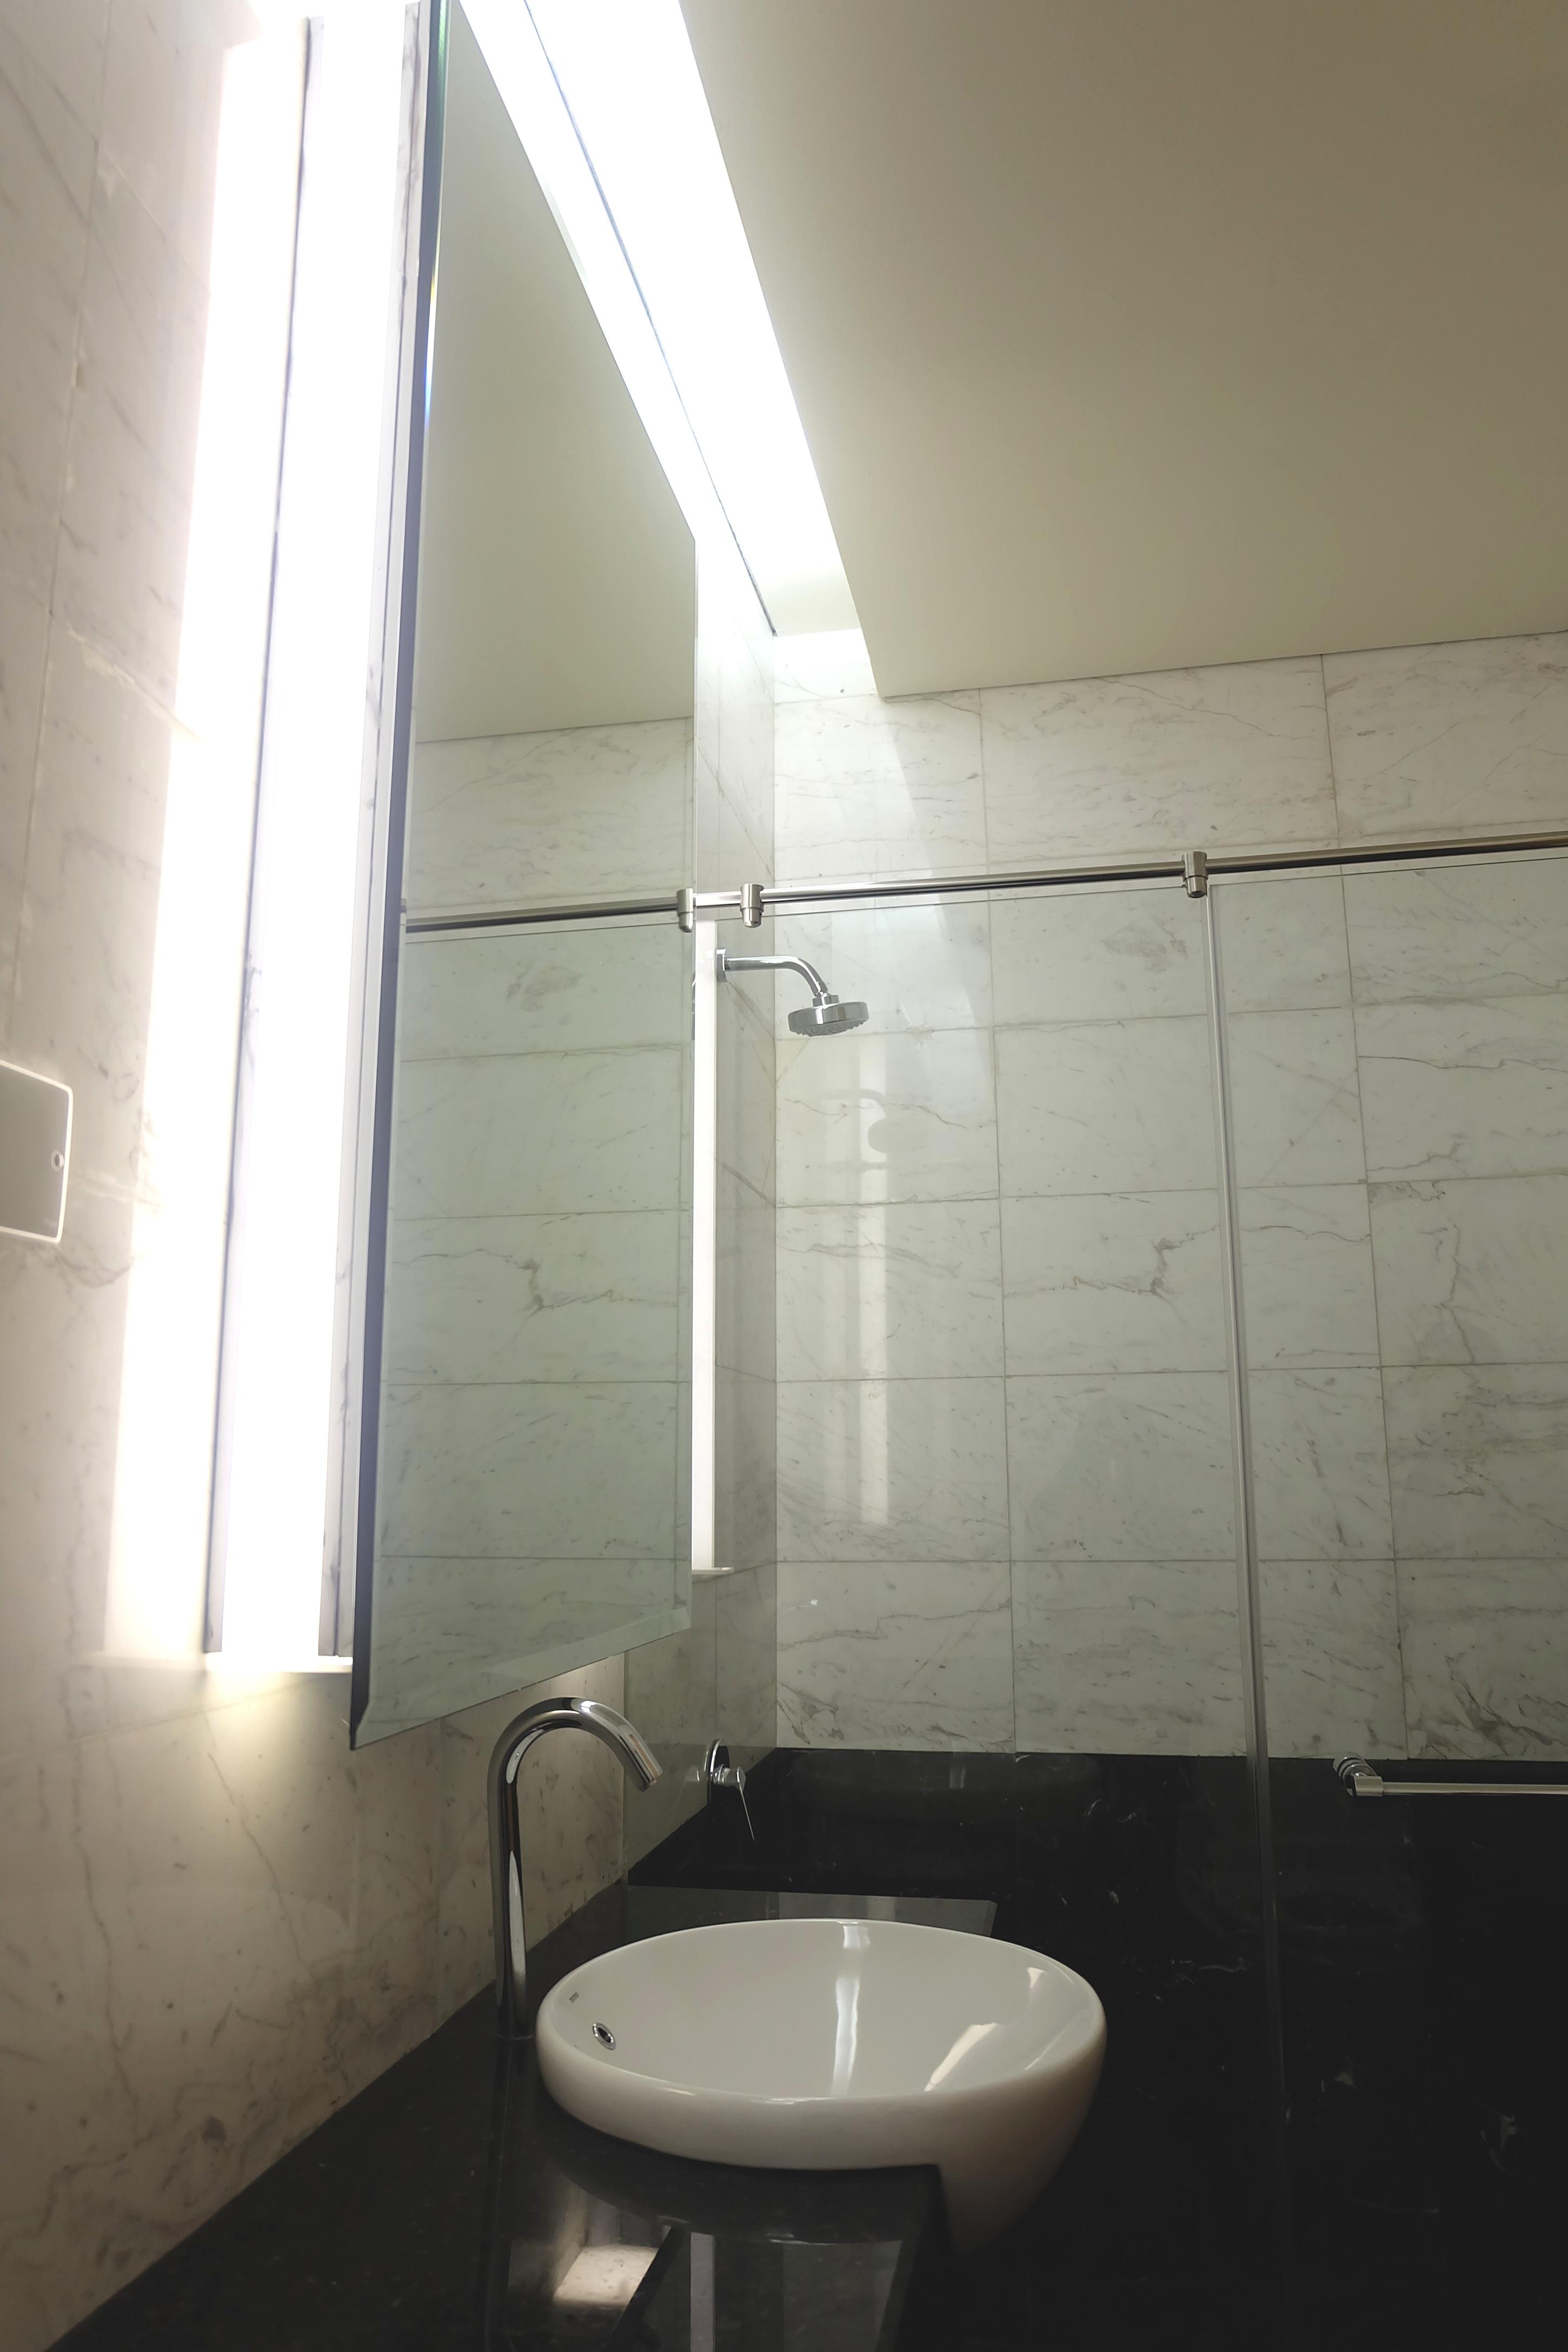 Executive Restroom 2